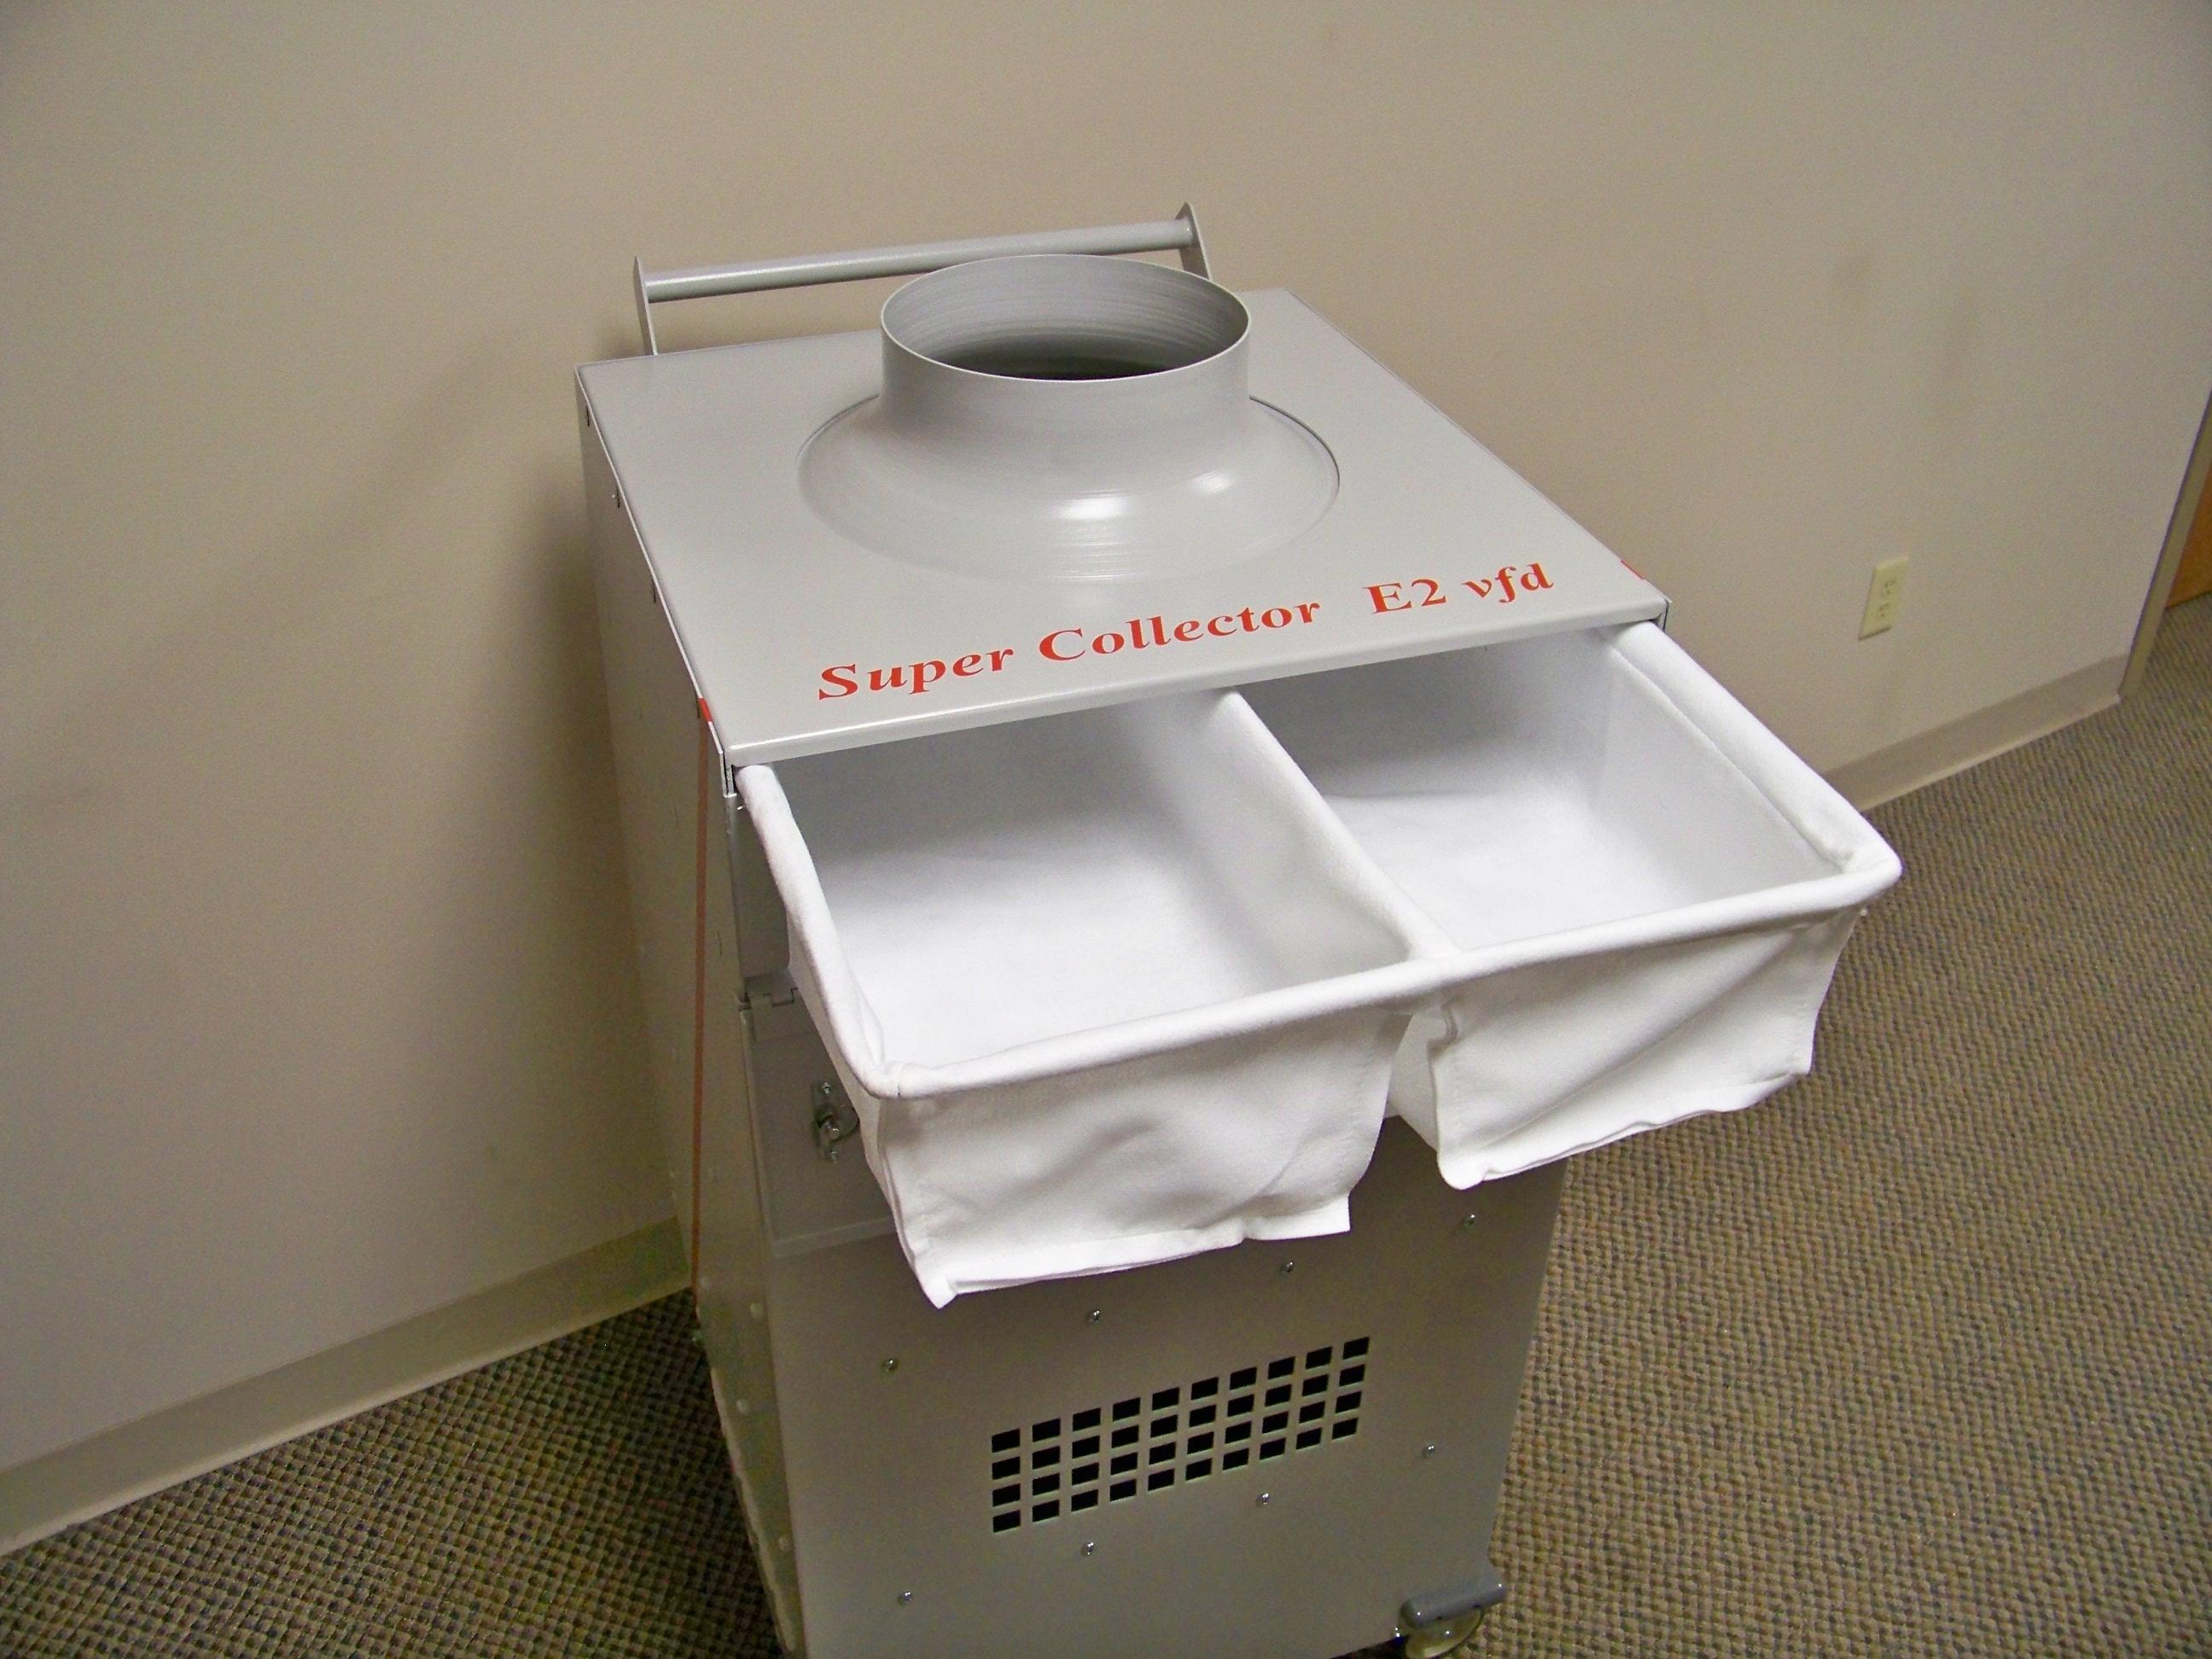 Super Collector